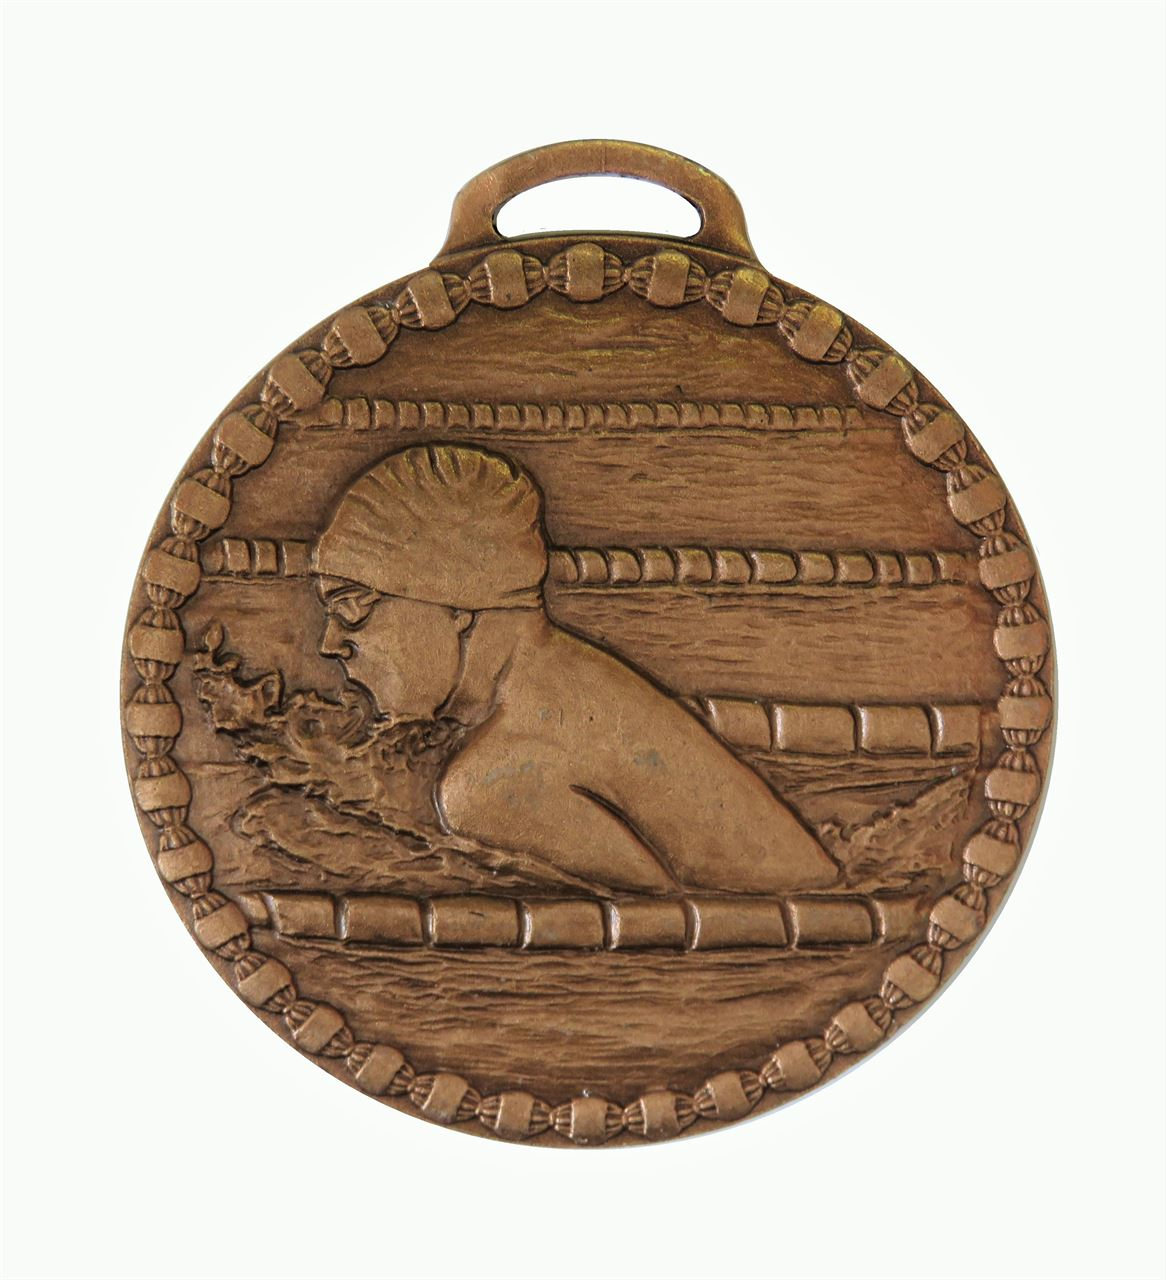 Copper Male Breaststroke Value Swimming Medal (size: 50mm) - 678E